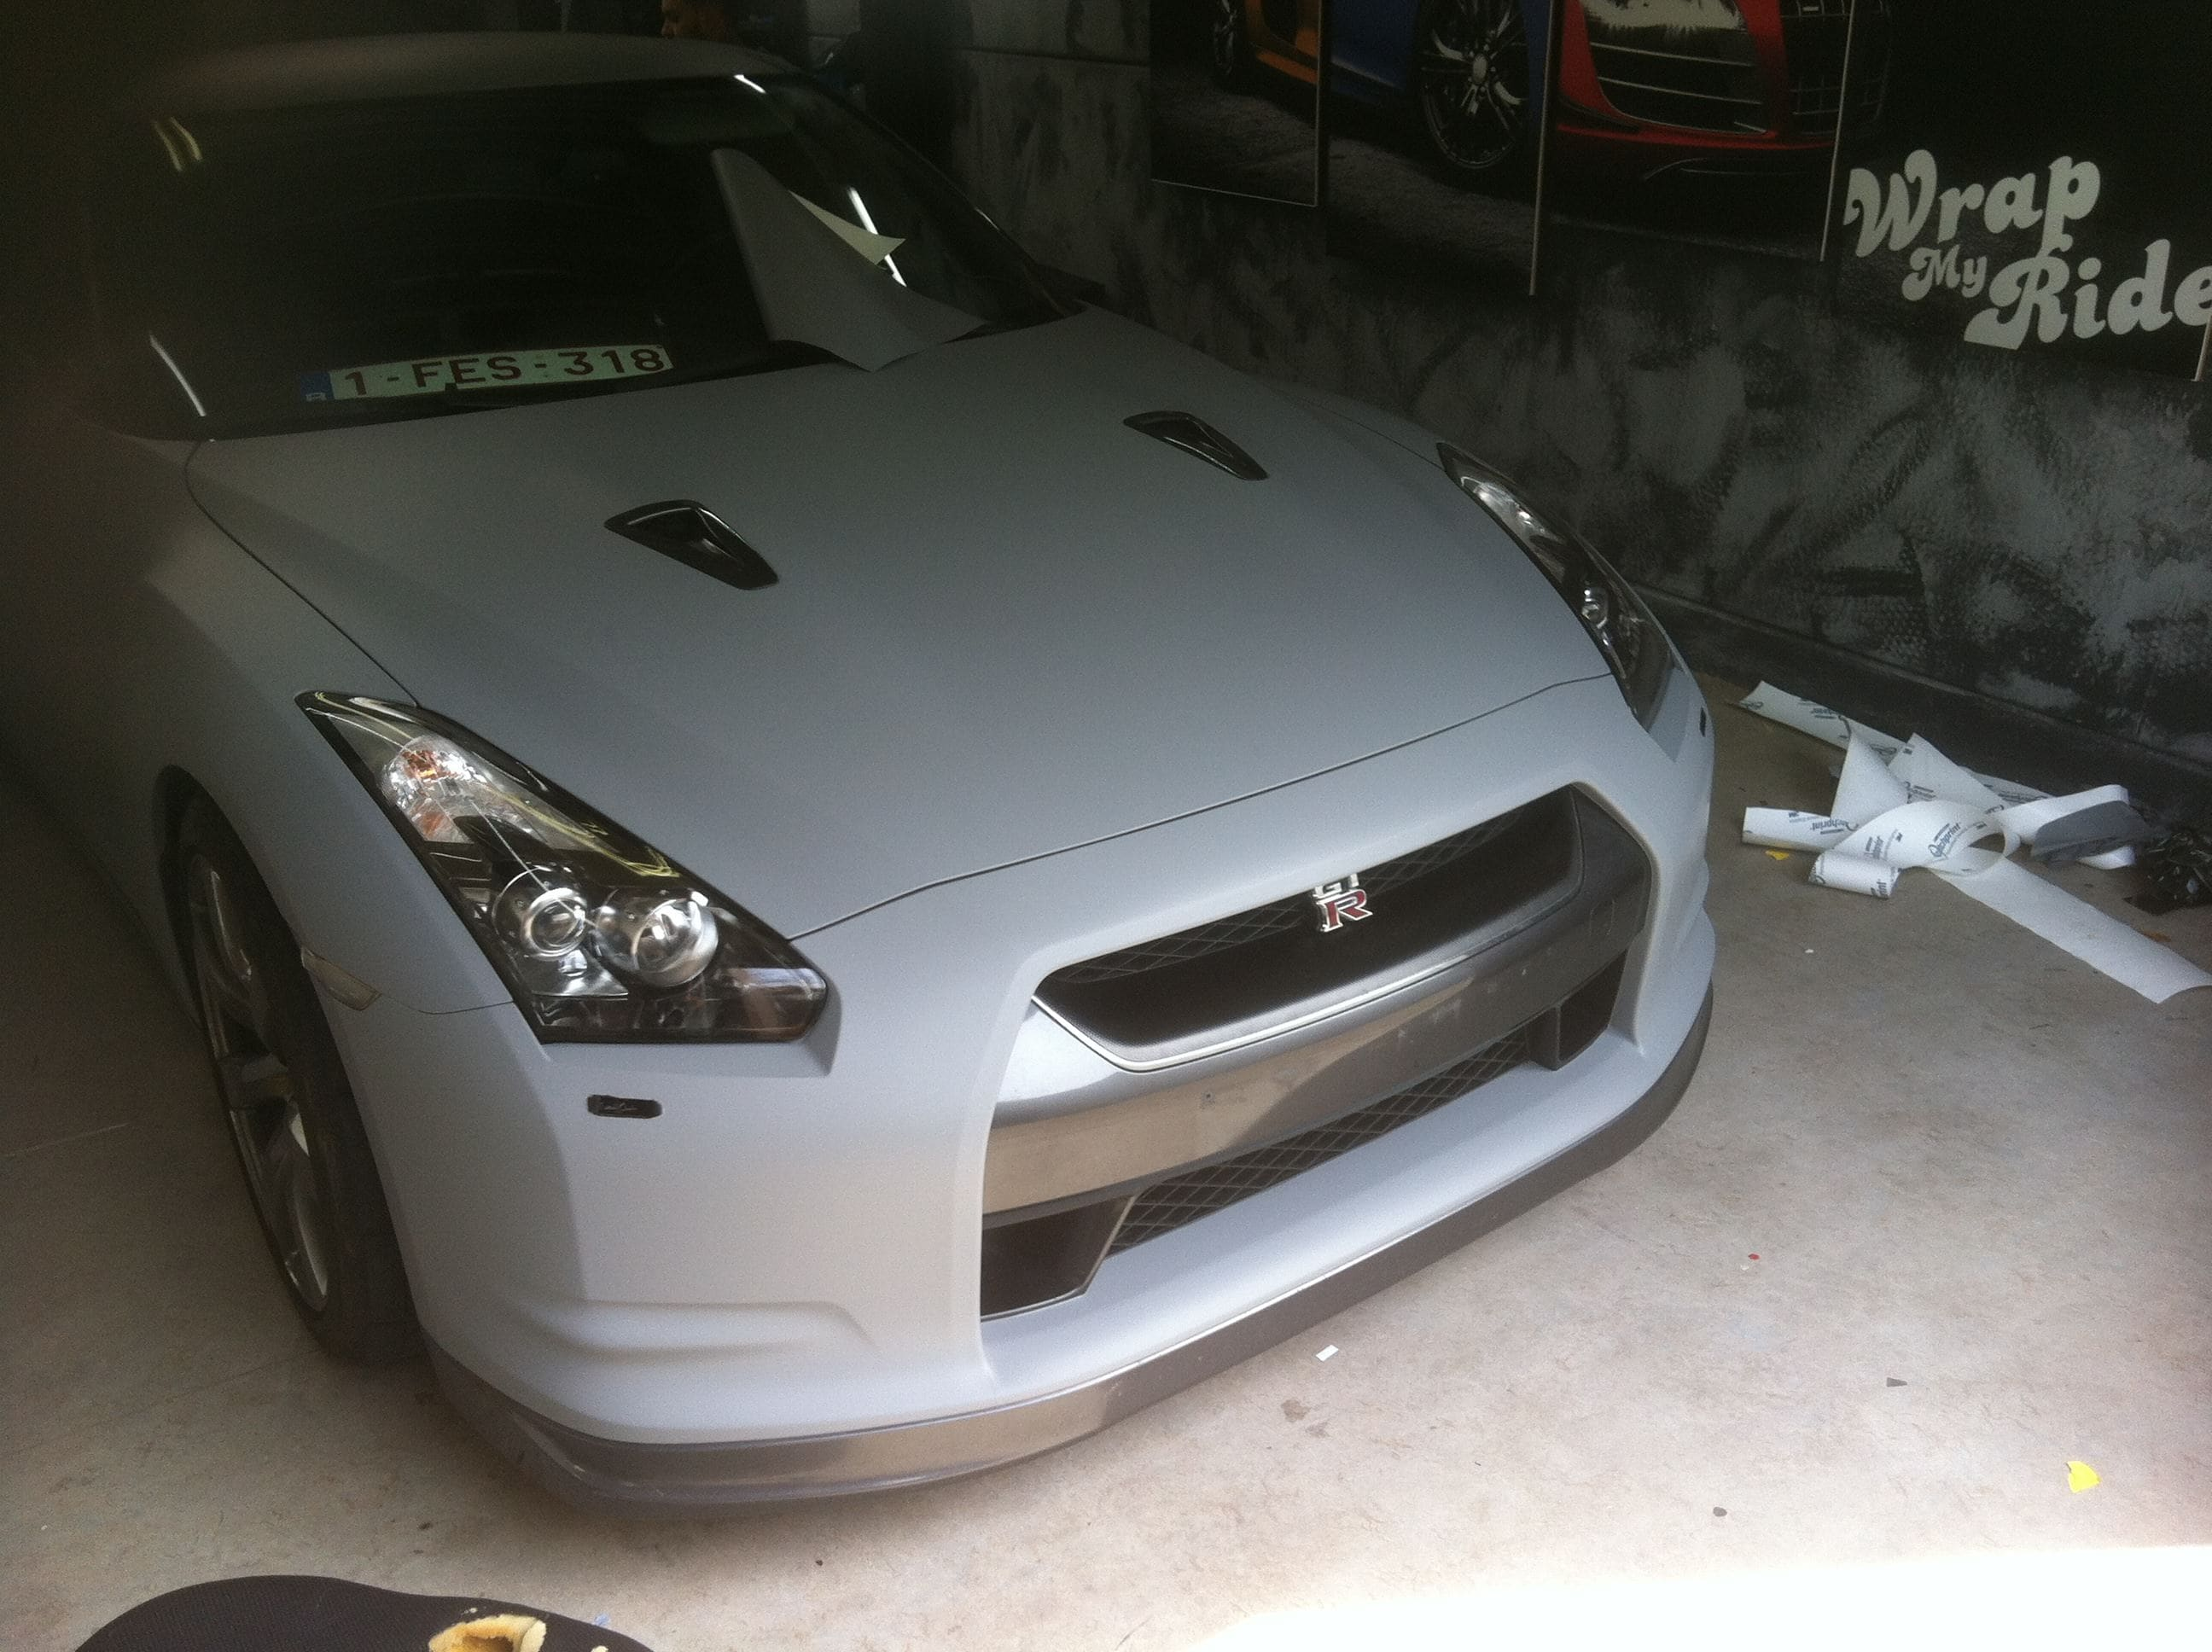 Nissan GT-R met Mat Grijze Wrap, Carwrapping door Wrapmyride.nu Foto-nr:6551, ©2020